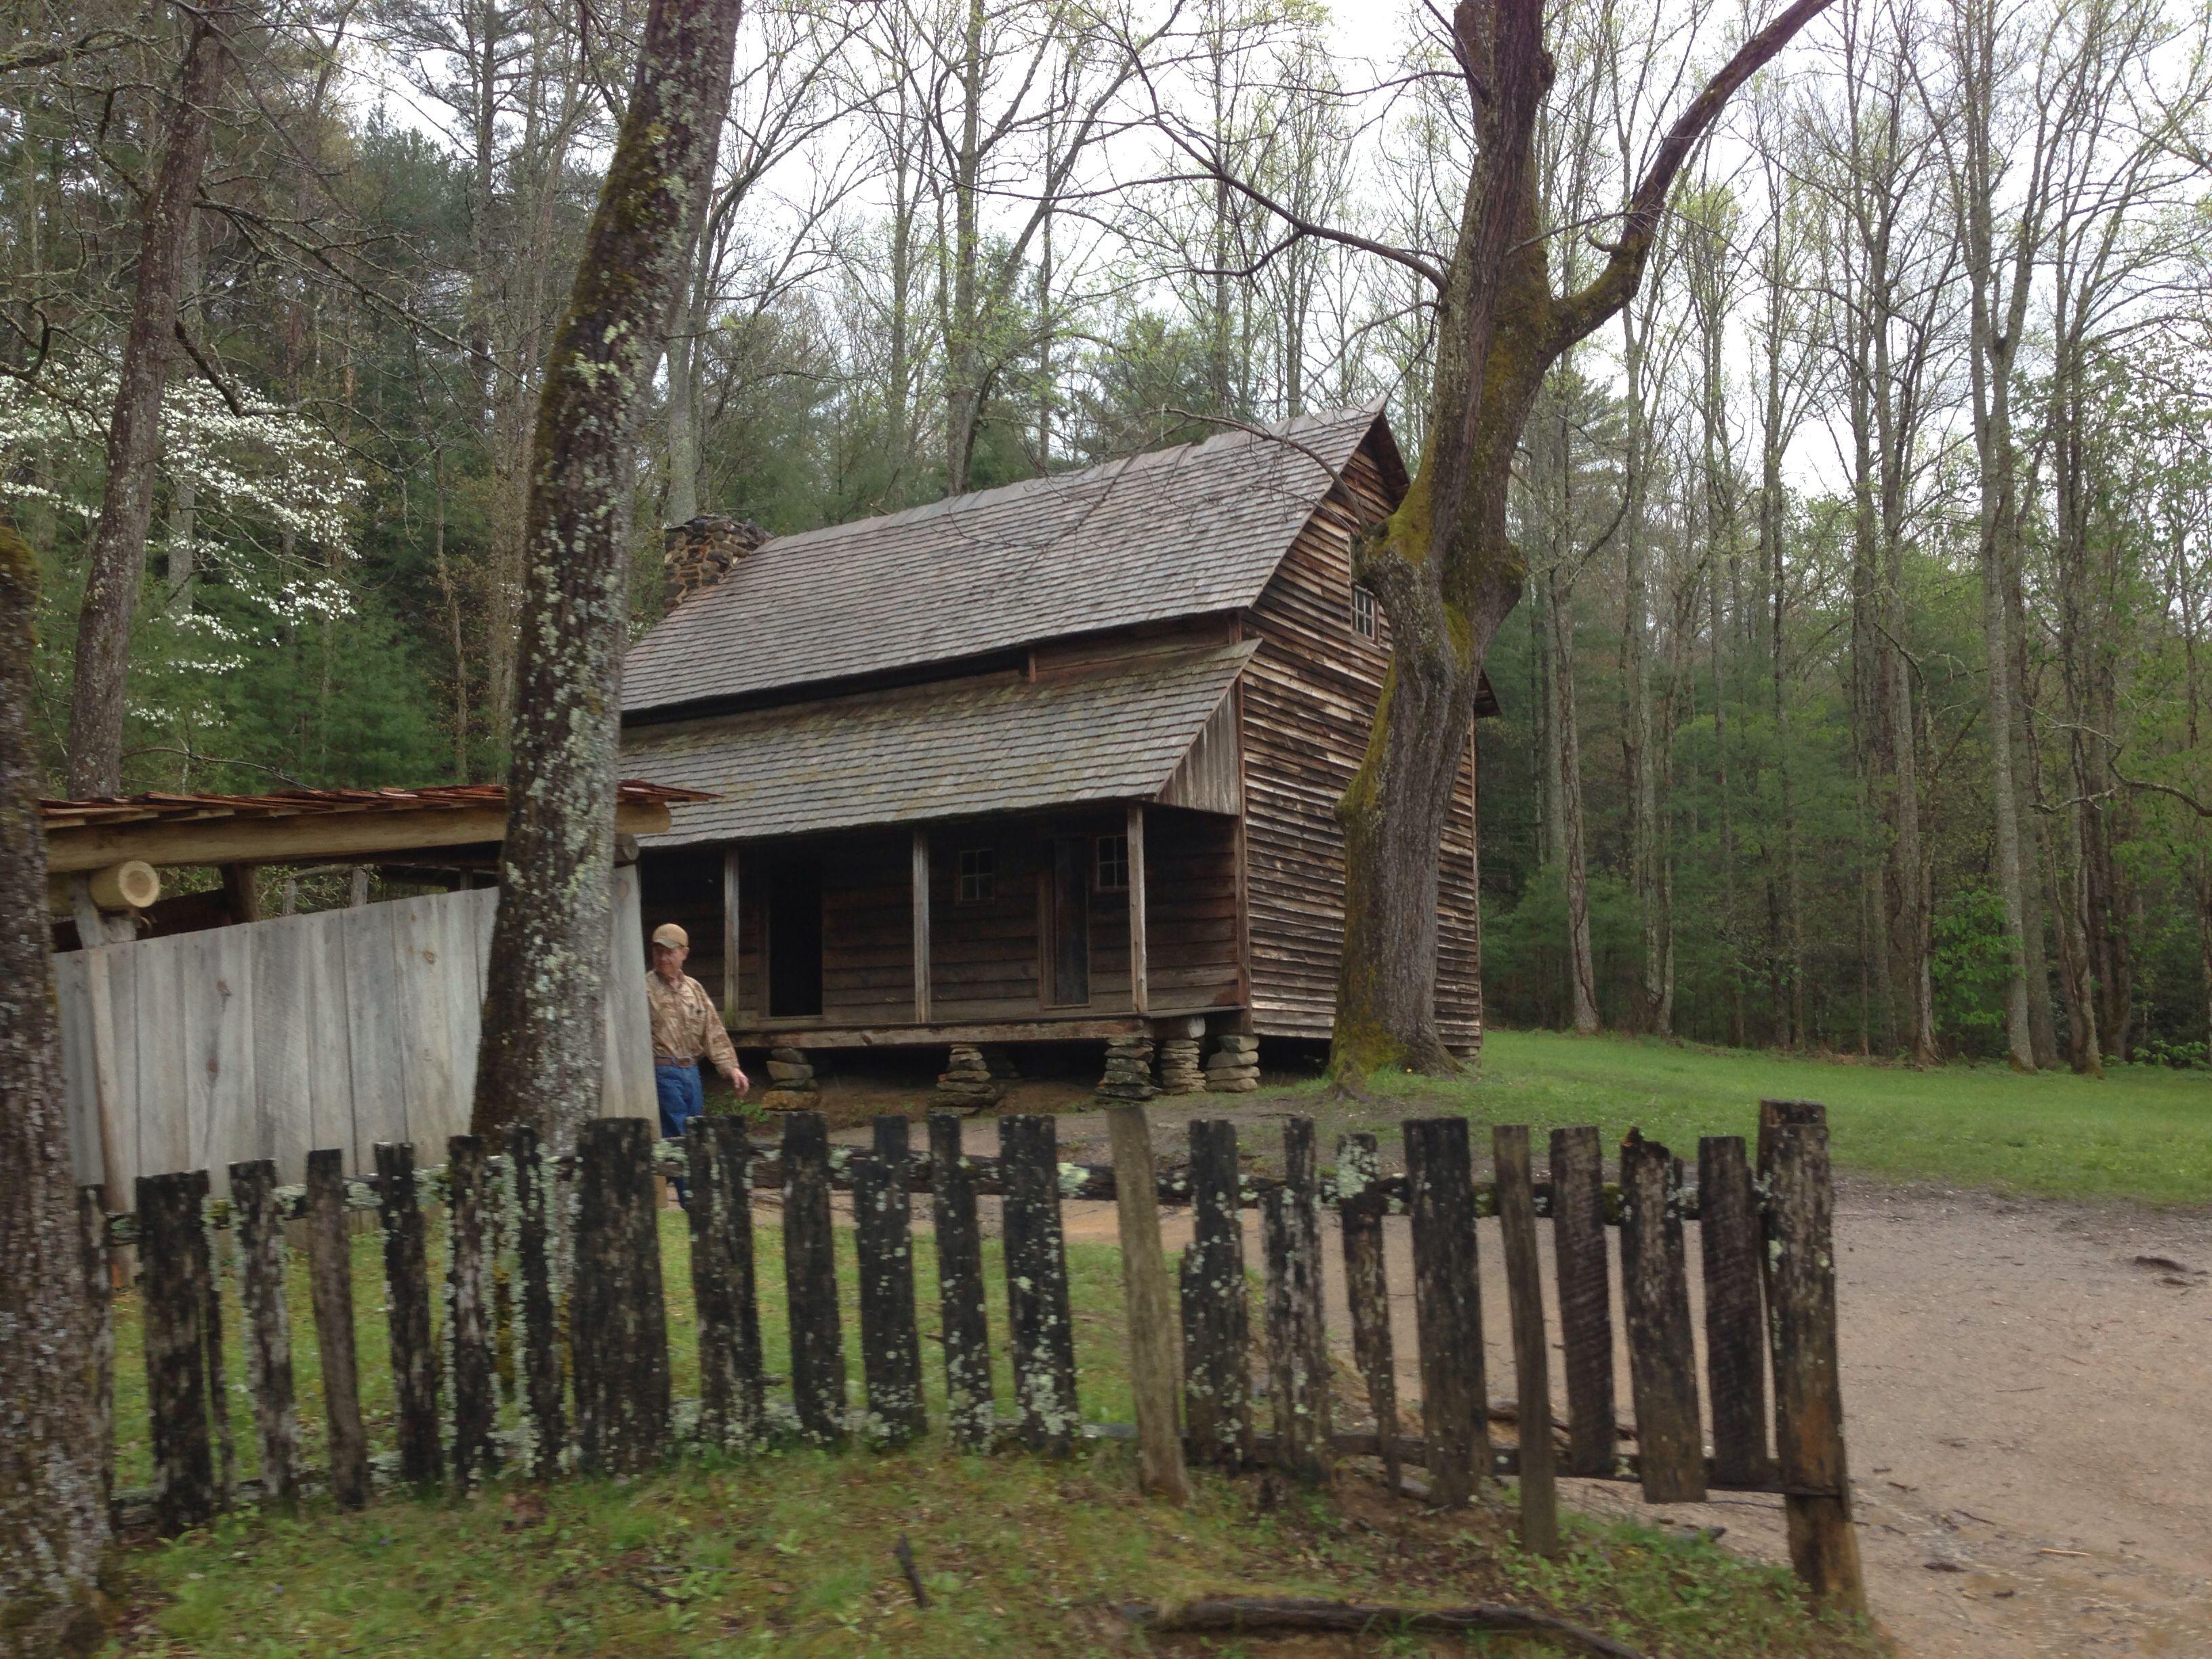 Old settlement Smokey Mountains Gatlinburg TN